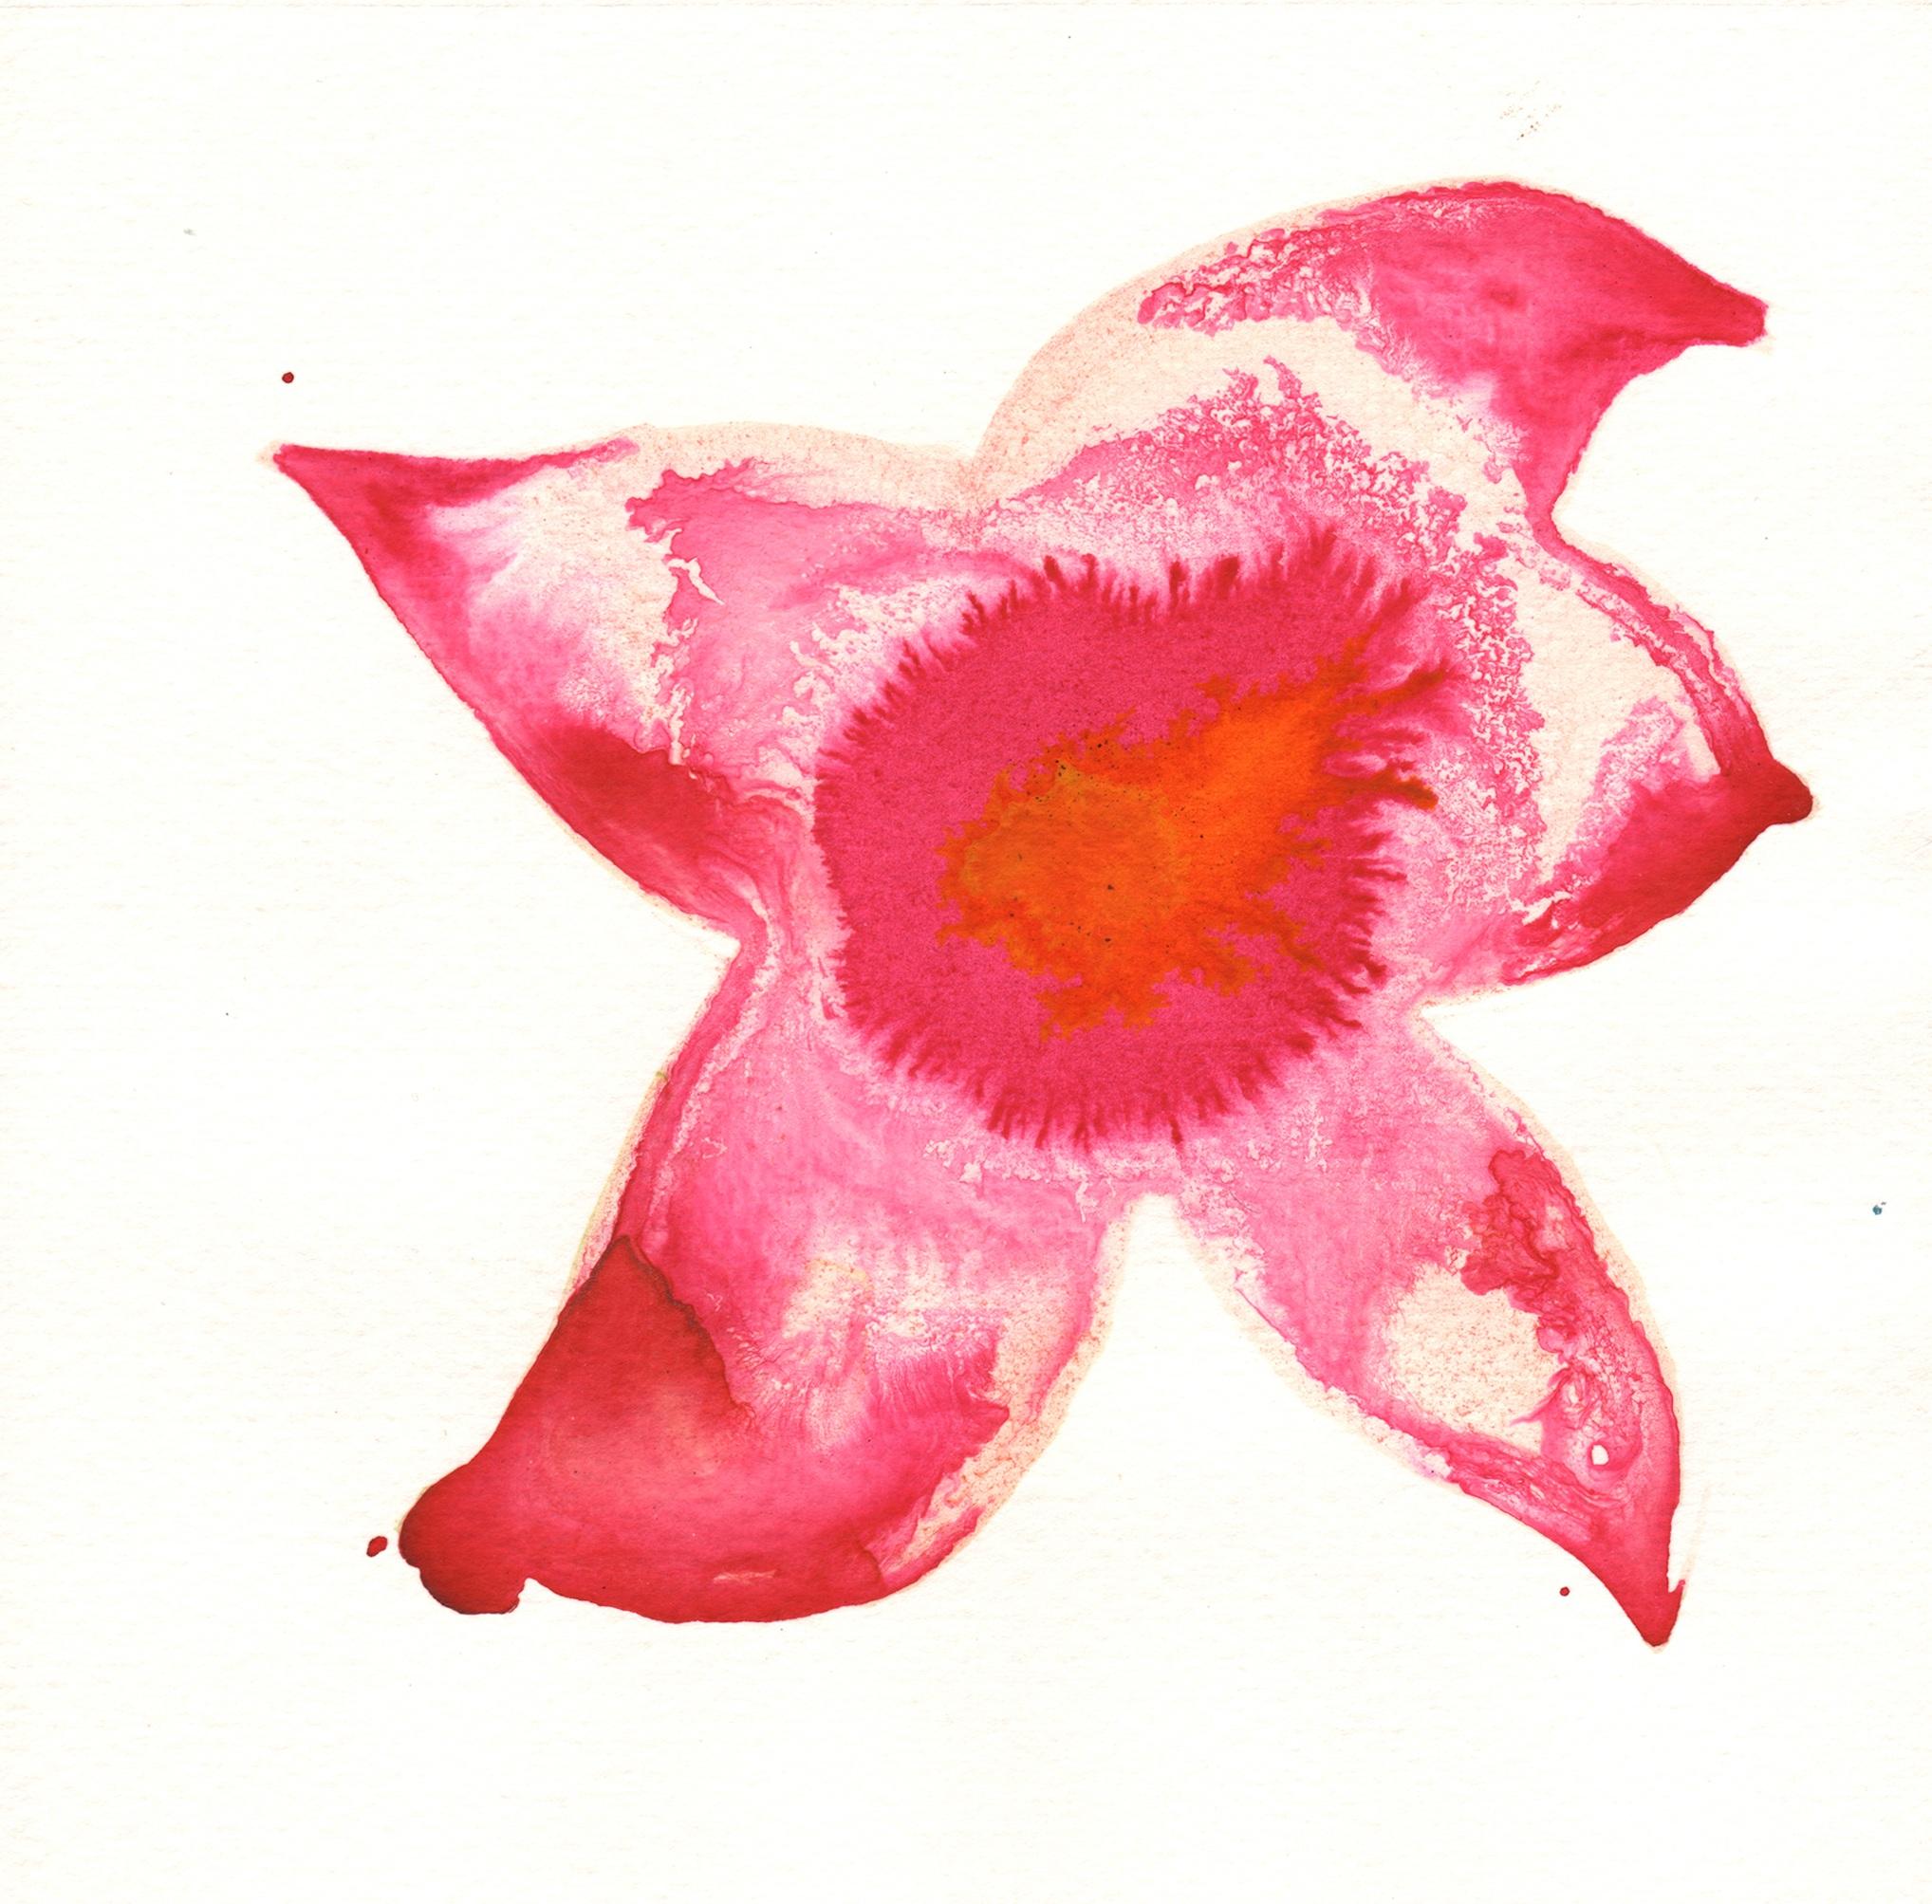 221.Passion.Flower.9.17.14.jpg